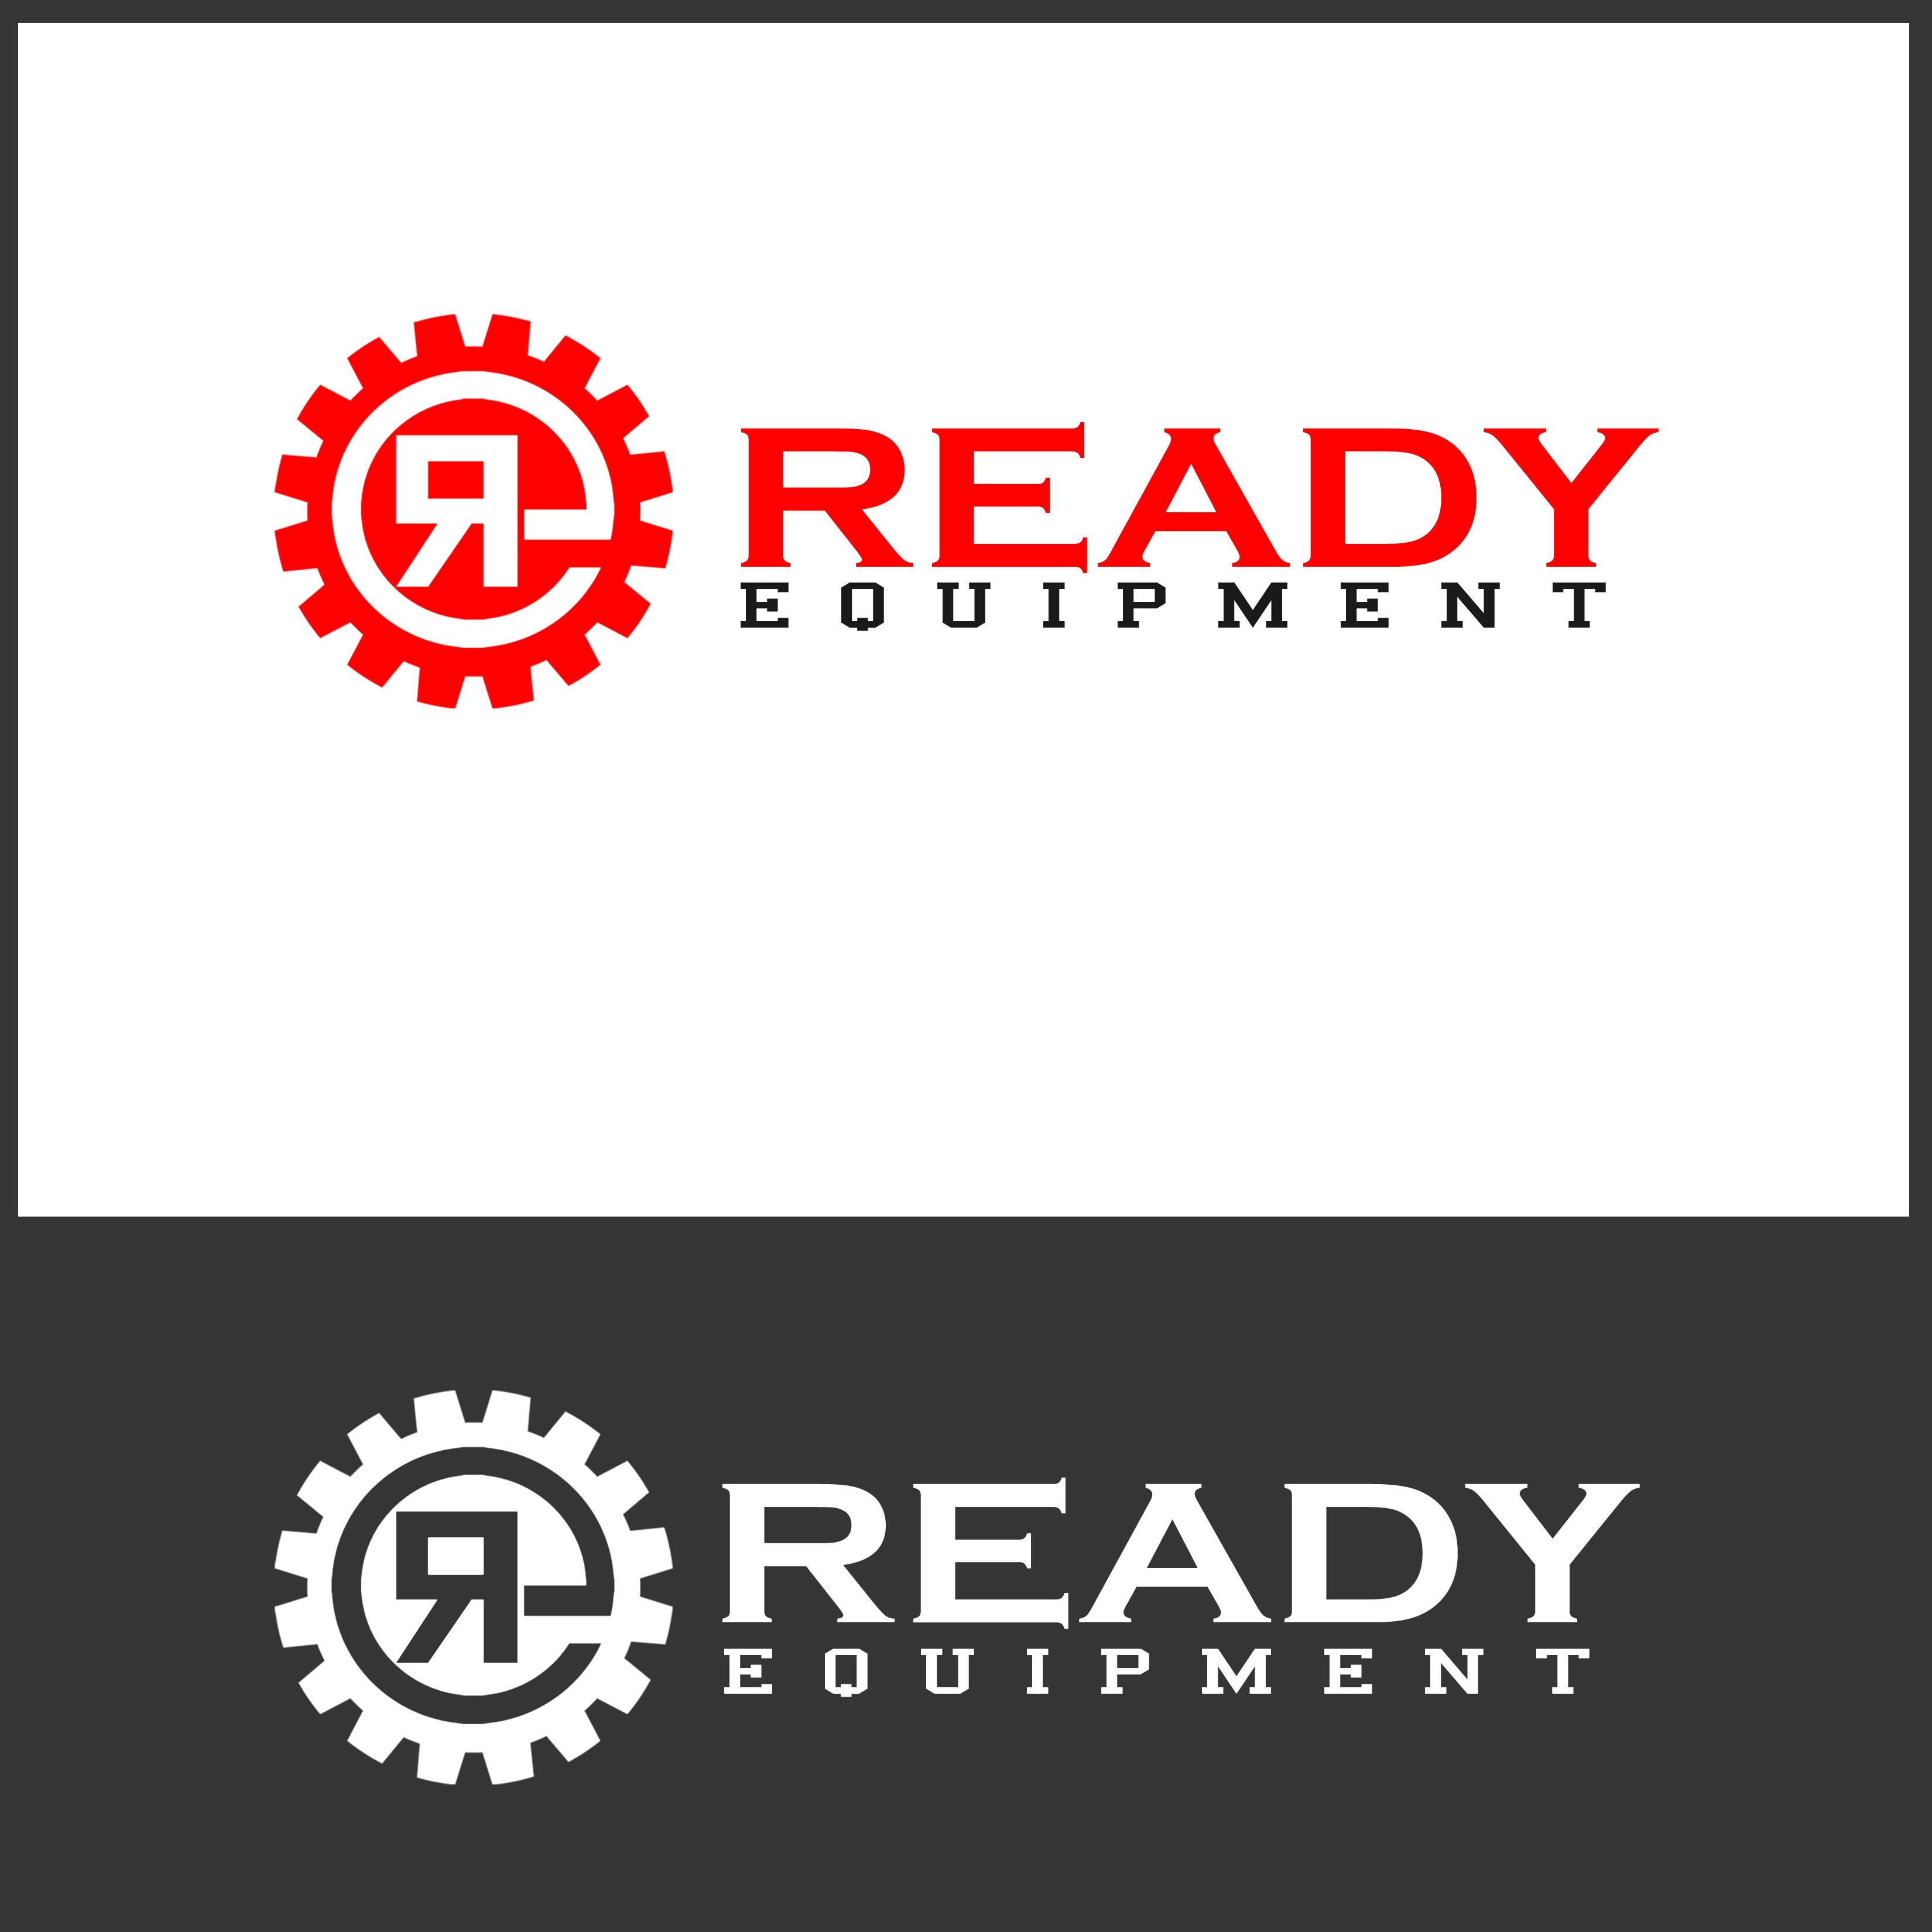 Logo Design by Allan Esclamado - Entry No. 150 in the Logo Design Contest Ready Equipment  Logo Design.